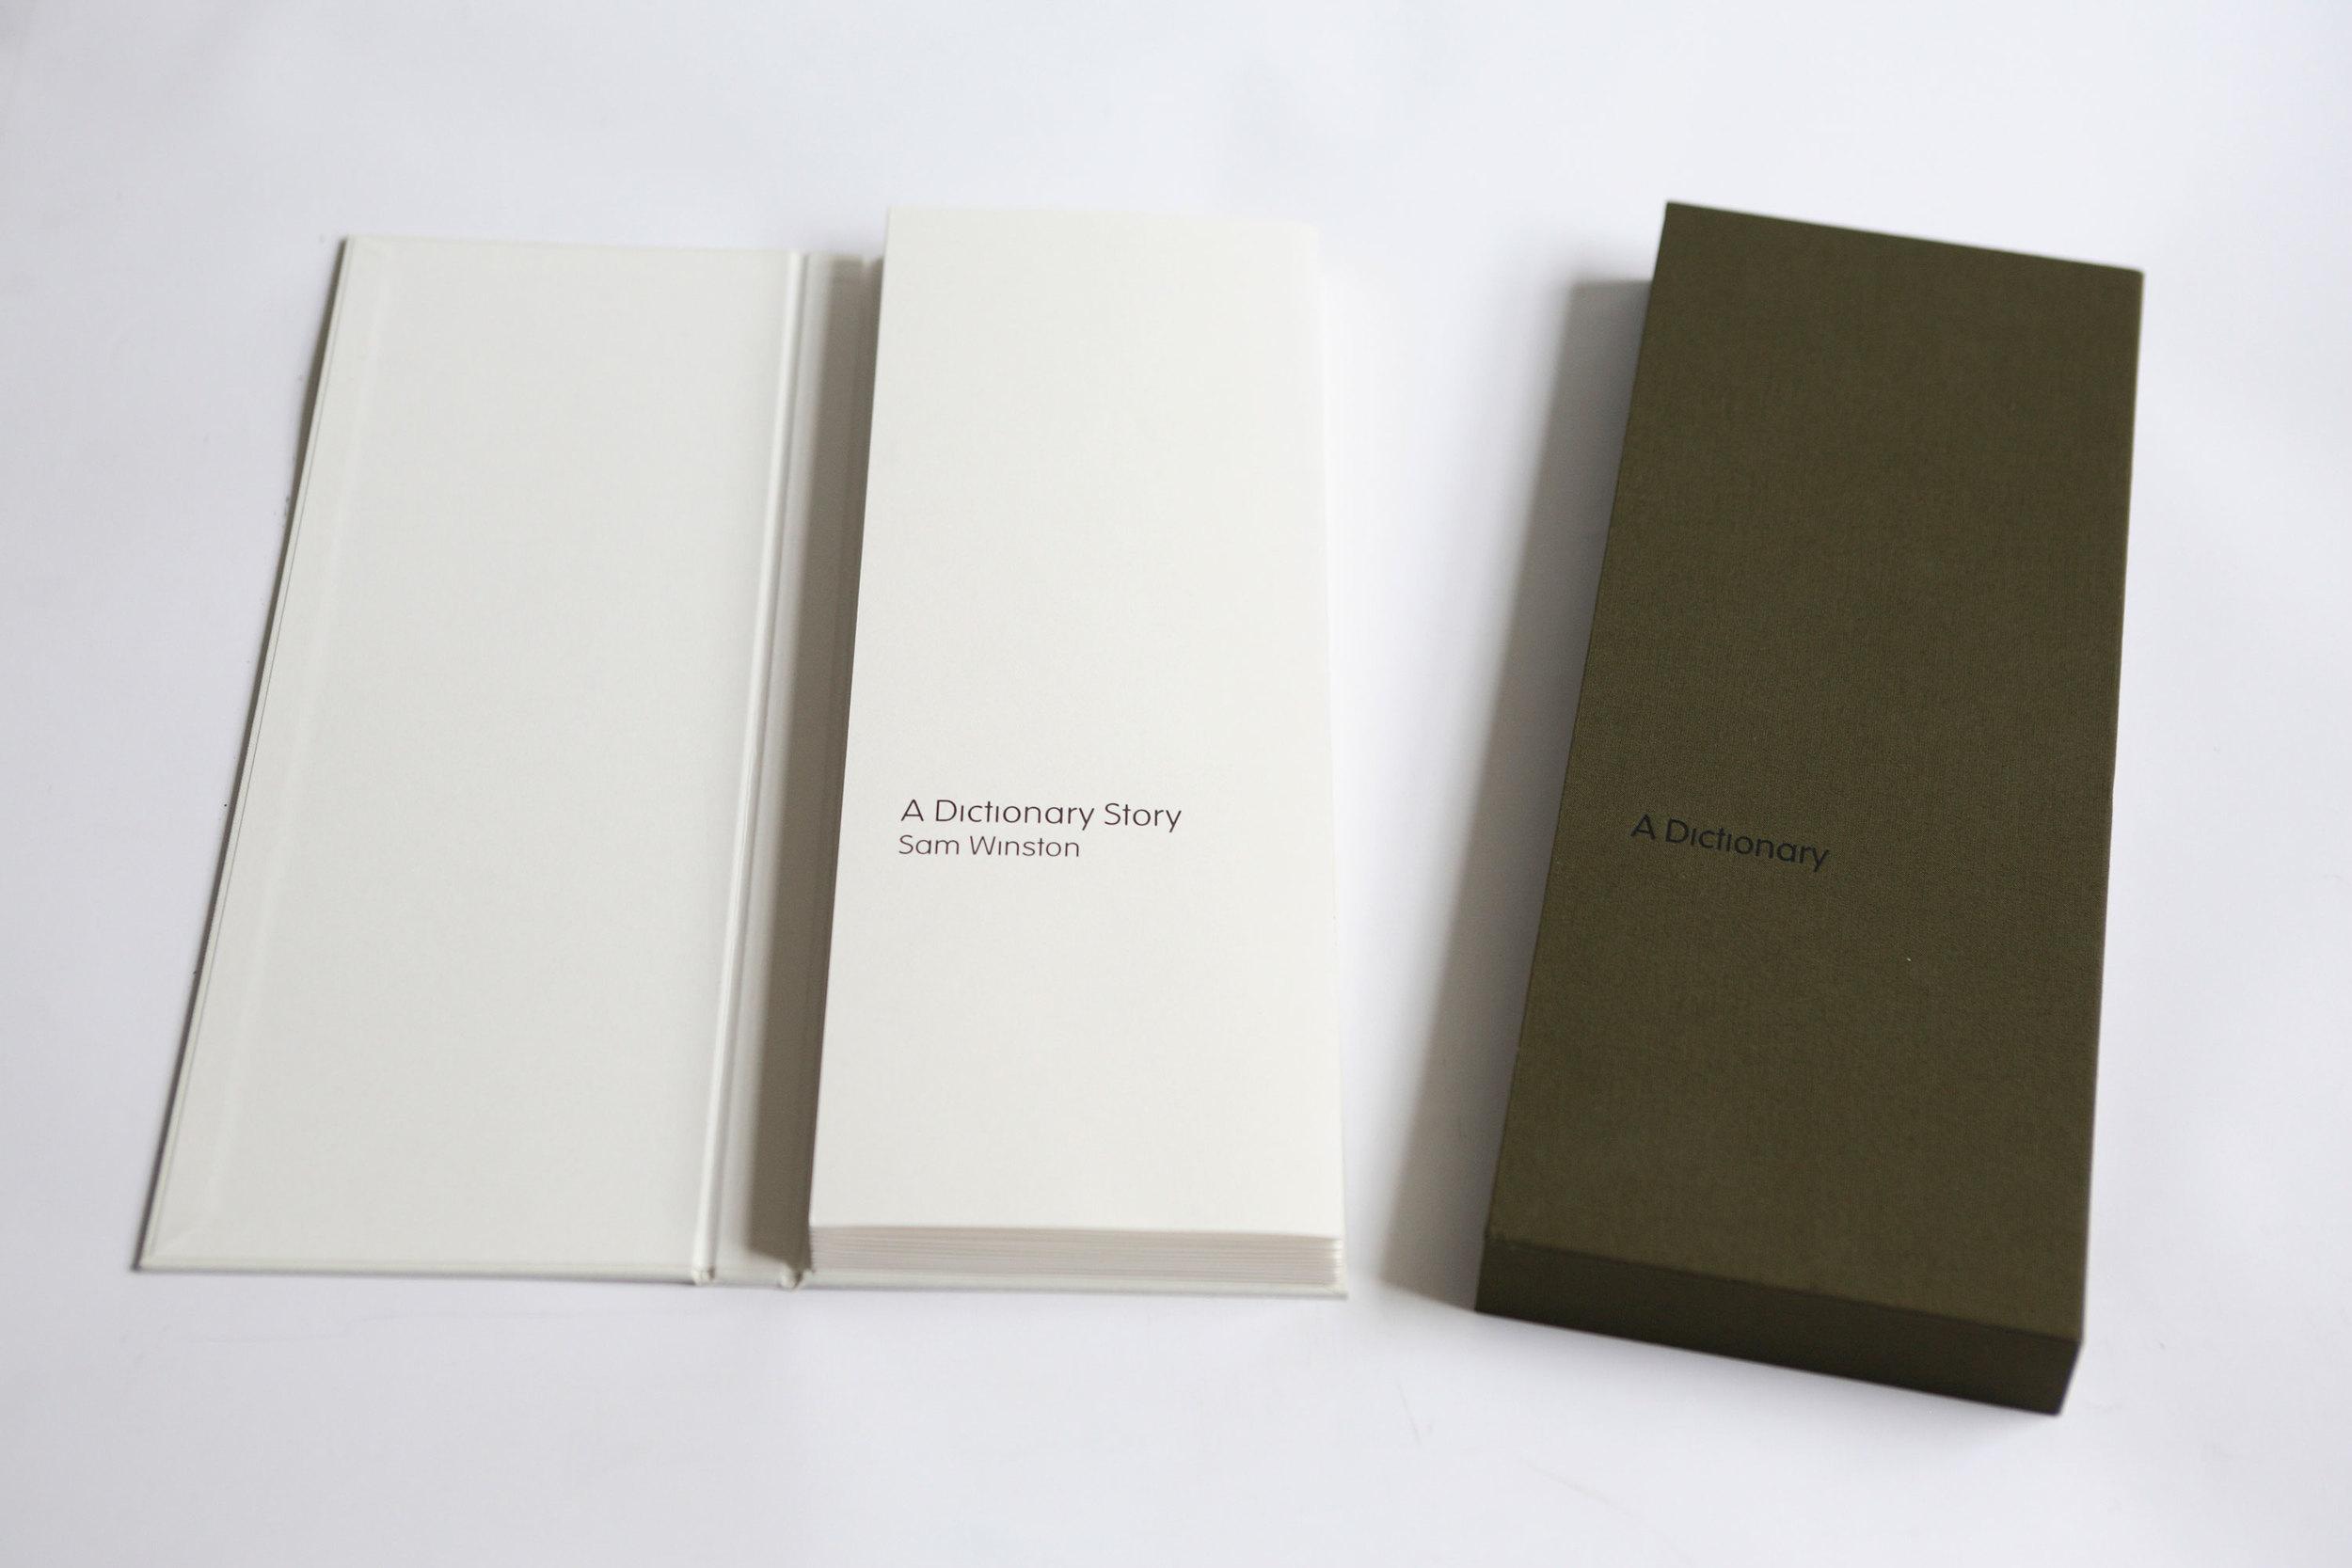 DictionaryStory02.jpg